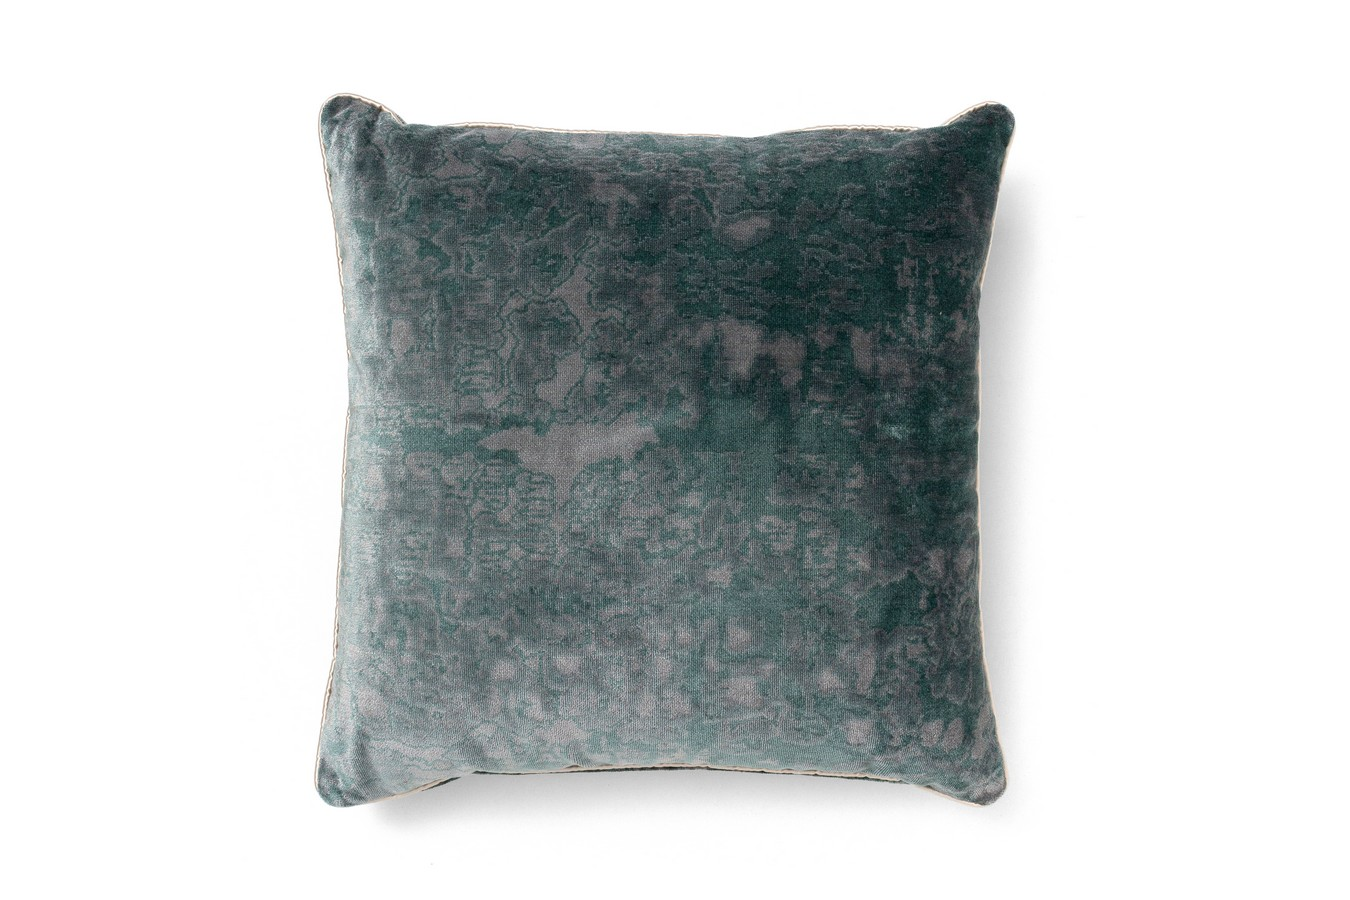 Modern Style Upholstered Fabrics by BRABBU WALLINGFORD BLUE ECLECTIC modern style Modern Style Upholstered Fabrics by BRABBU Modern Style Upholstered Fabrics by BRABBU WALLINGFORD BLUE ECLECTIC